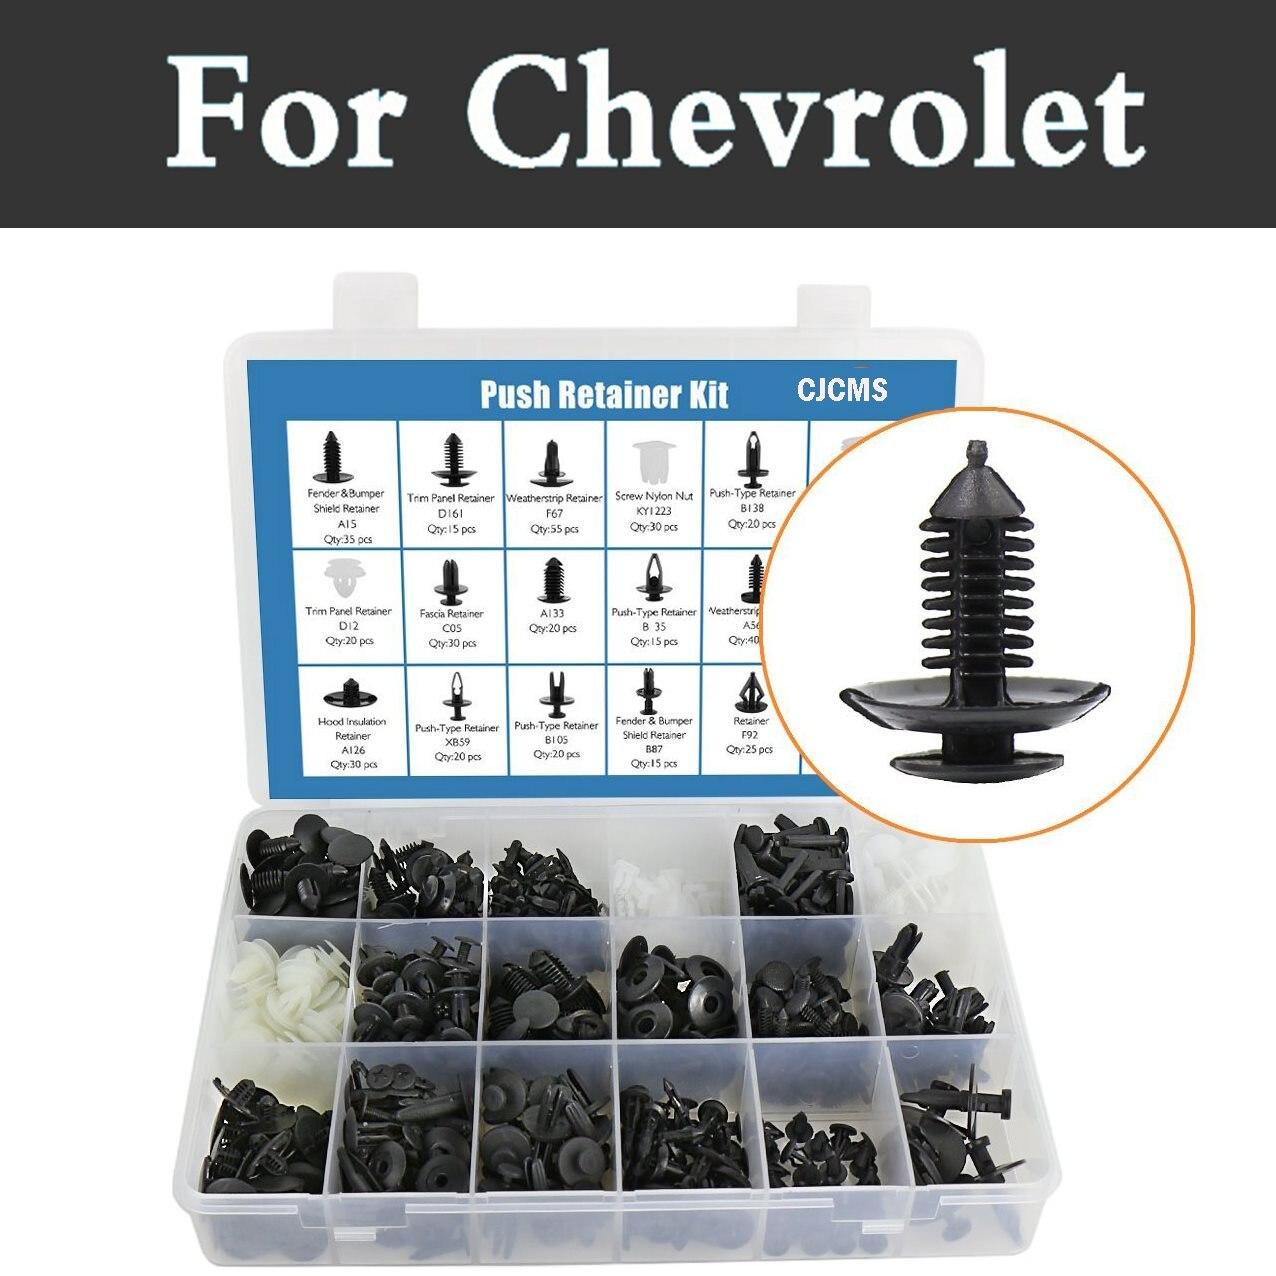 Herramienta de extracción de embellecedor para coche de 415 uds, Clips de remaches de empuje, Kit de remaches para Chevrolet SS suburbano Tahoe Tracker Traverse Viva Volt